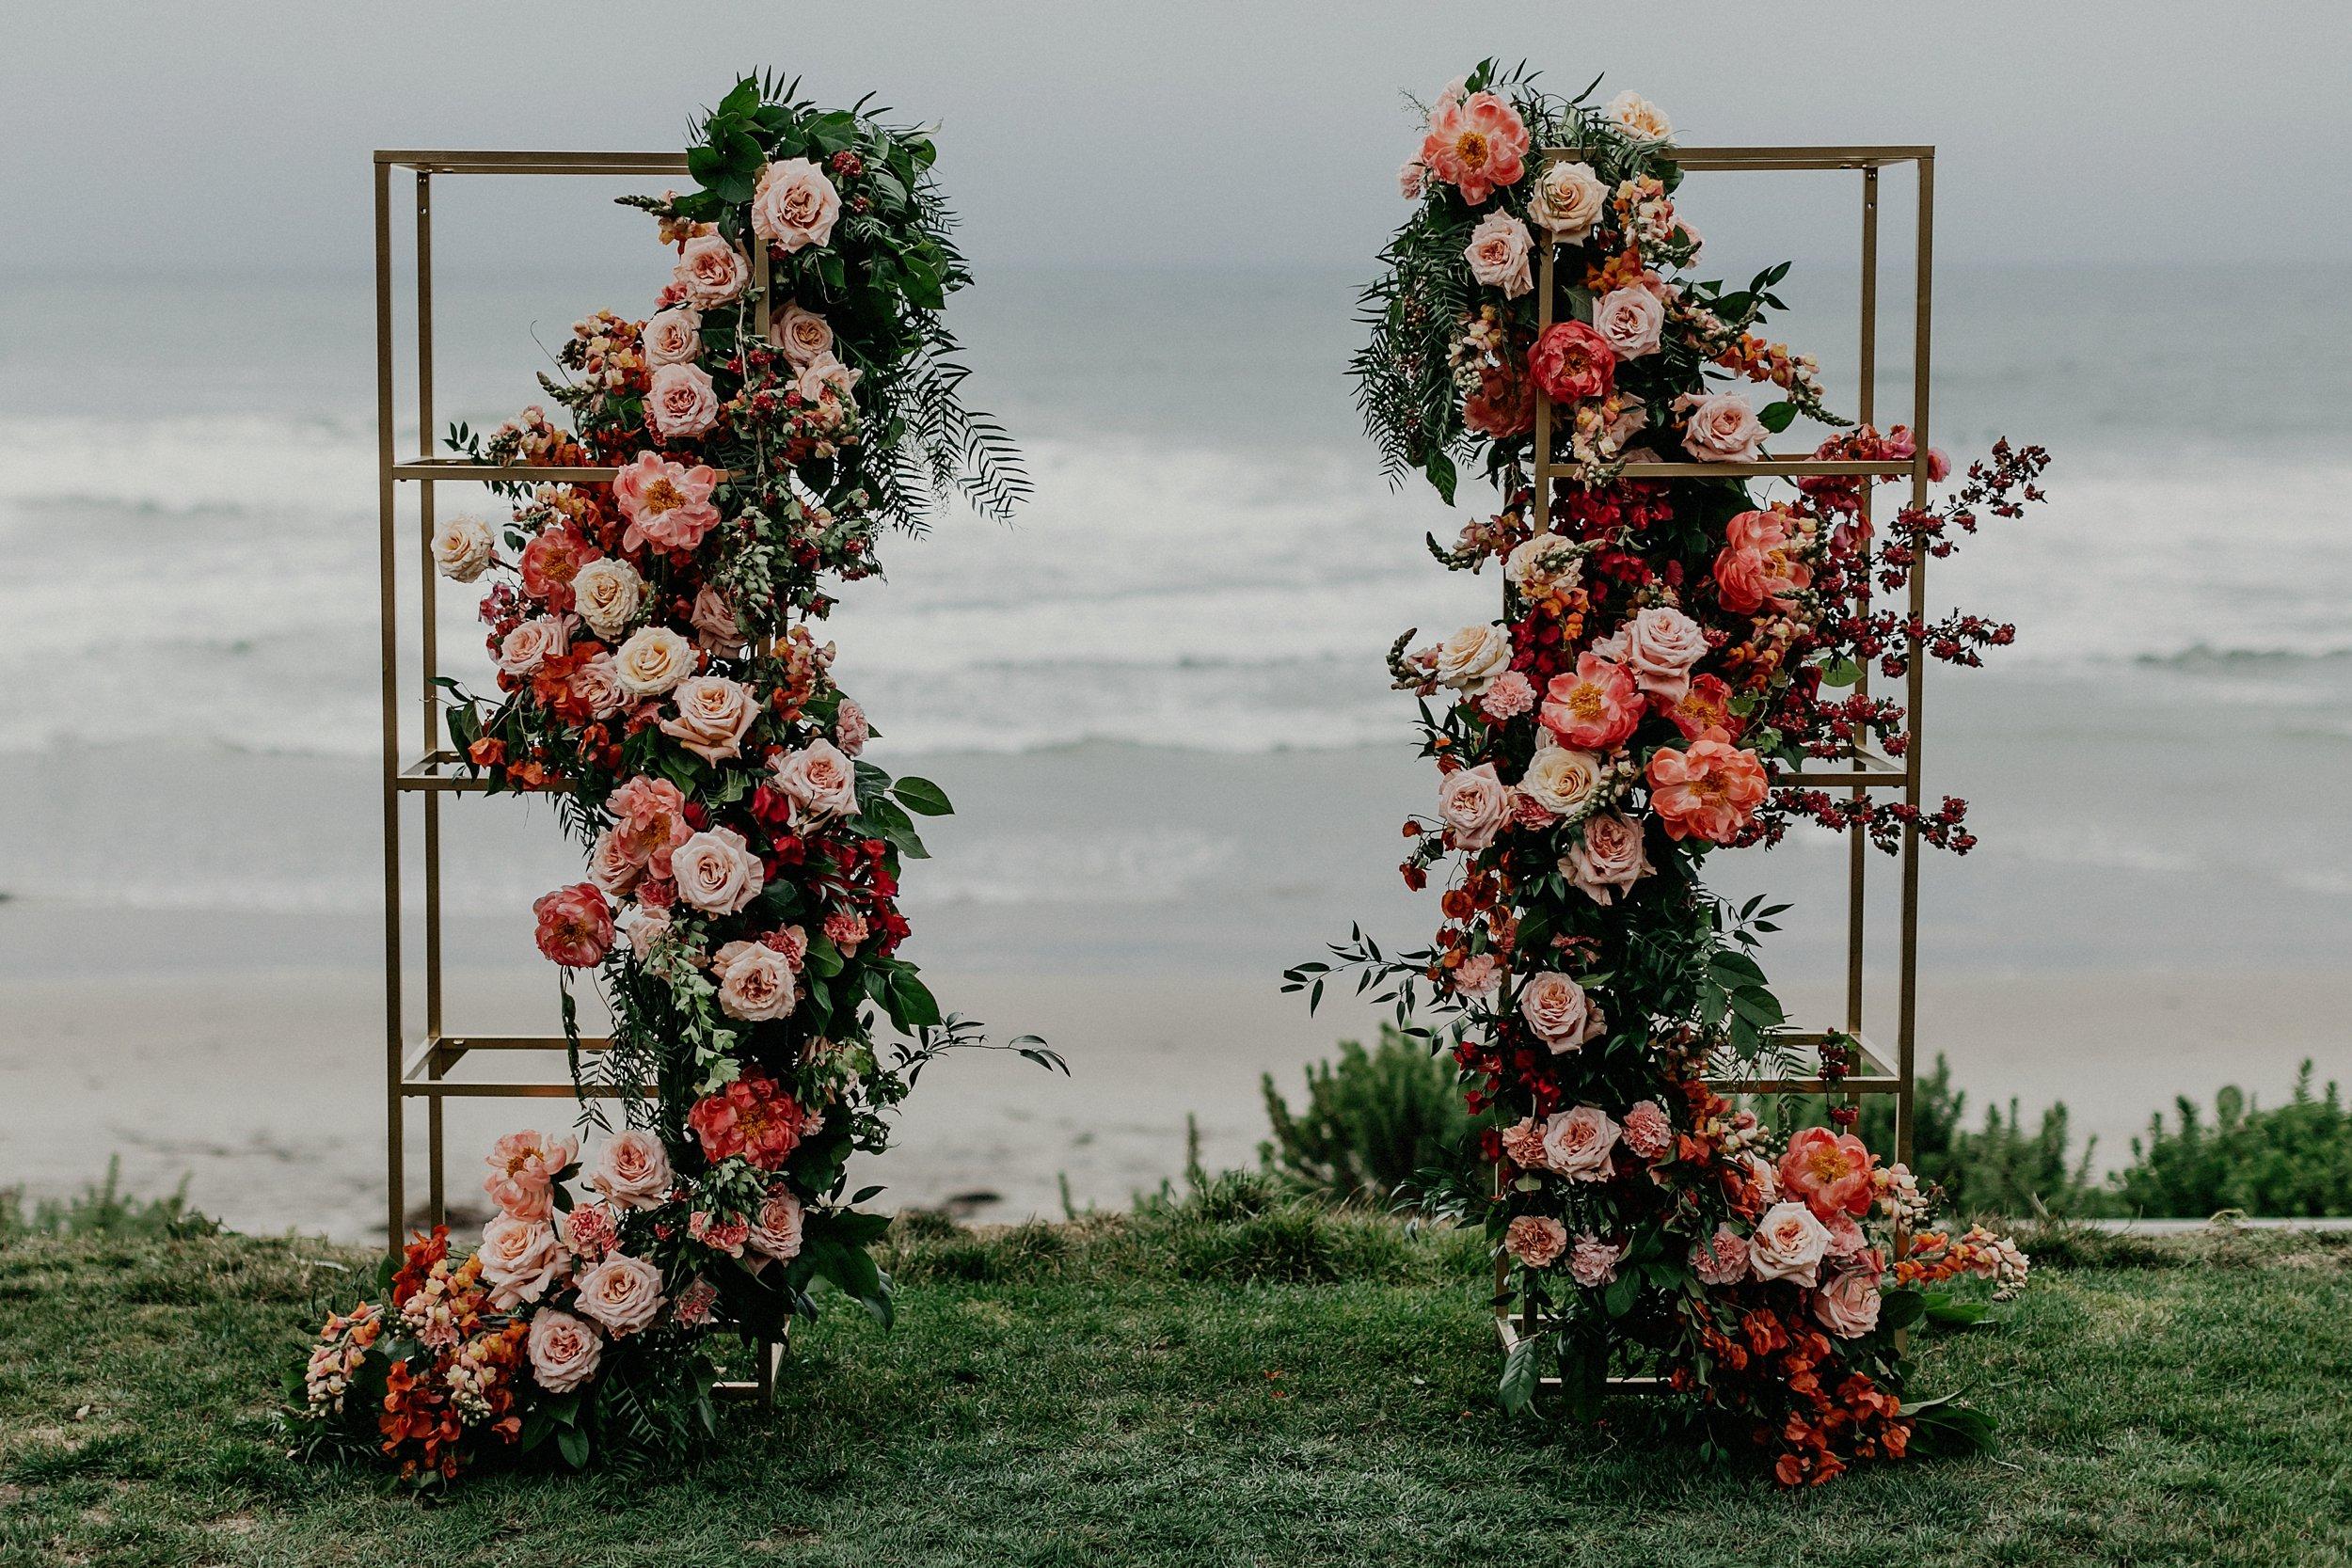 Scripps Seaside Forum, San Diego, California_0047.jpg